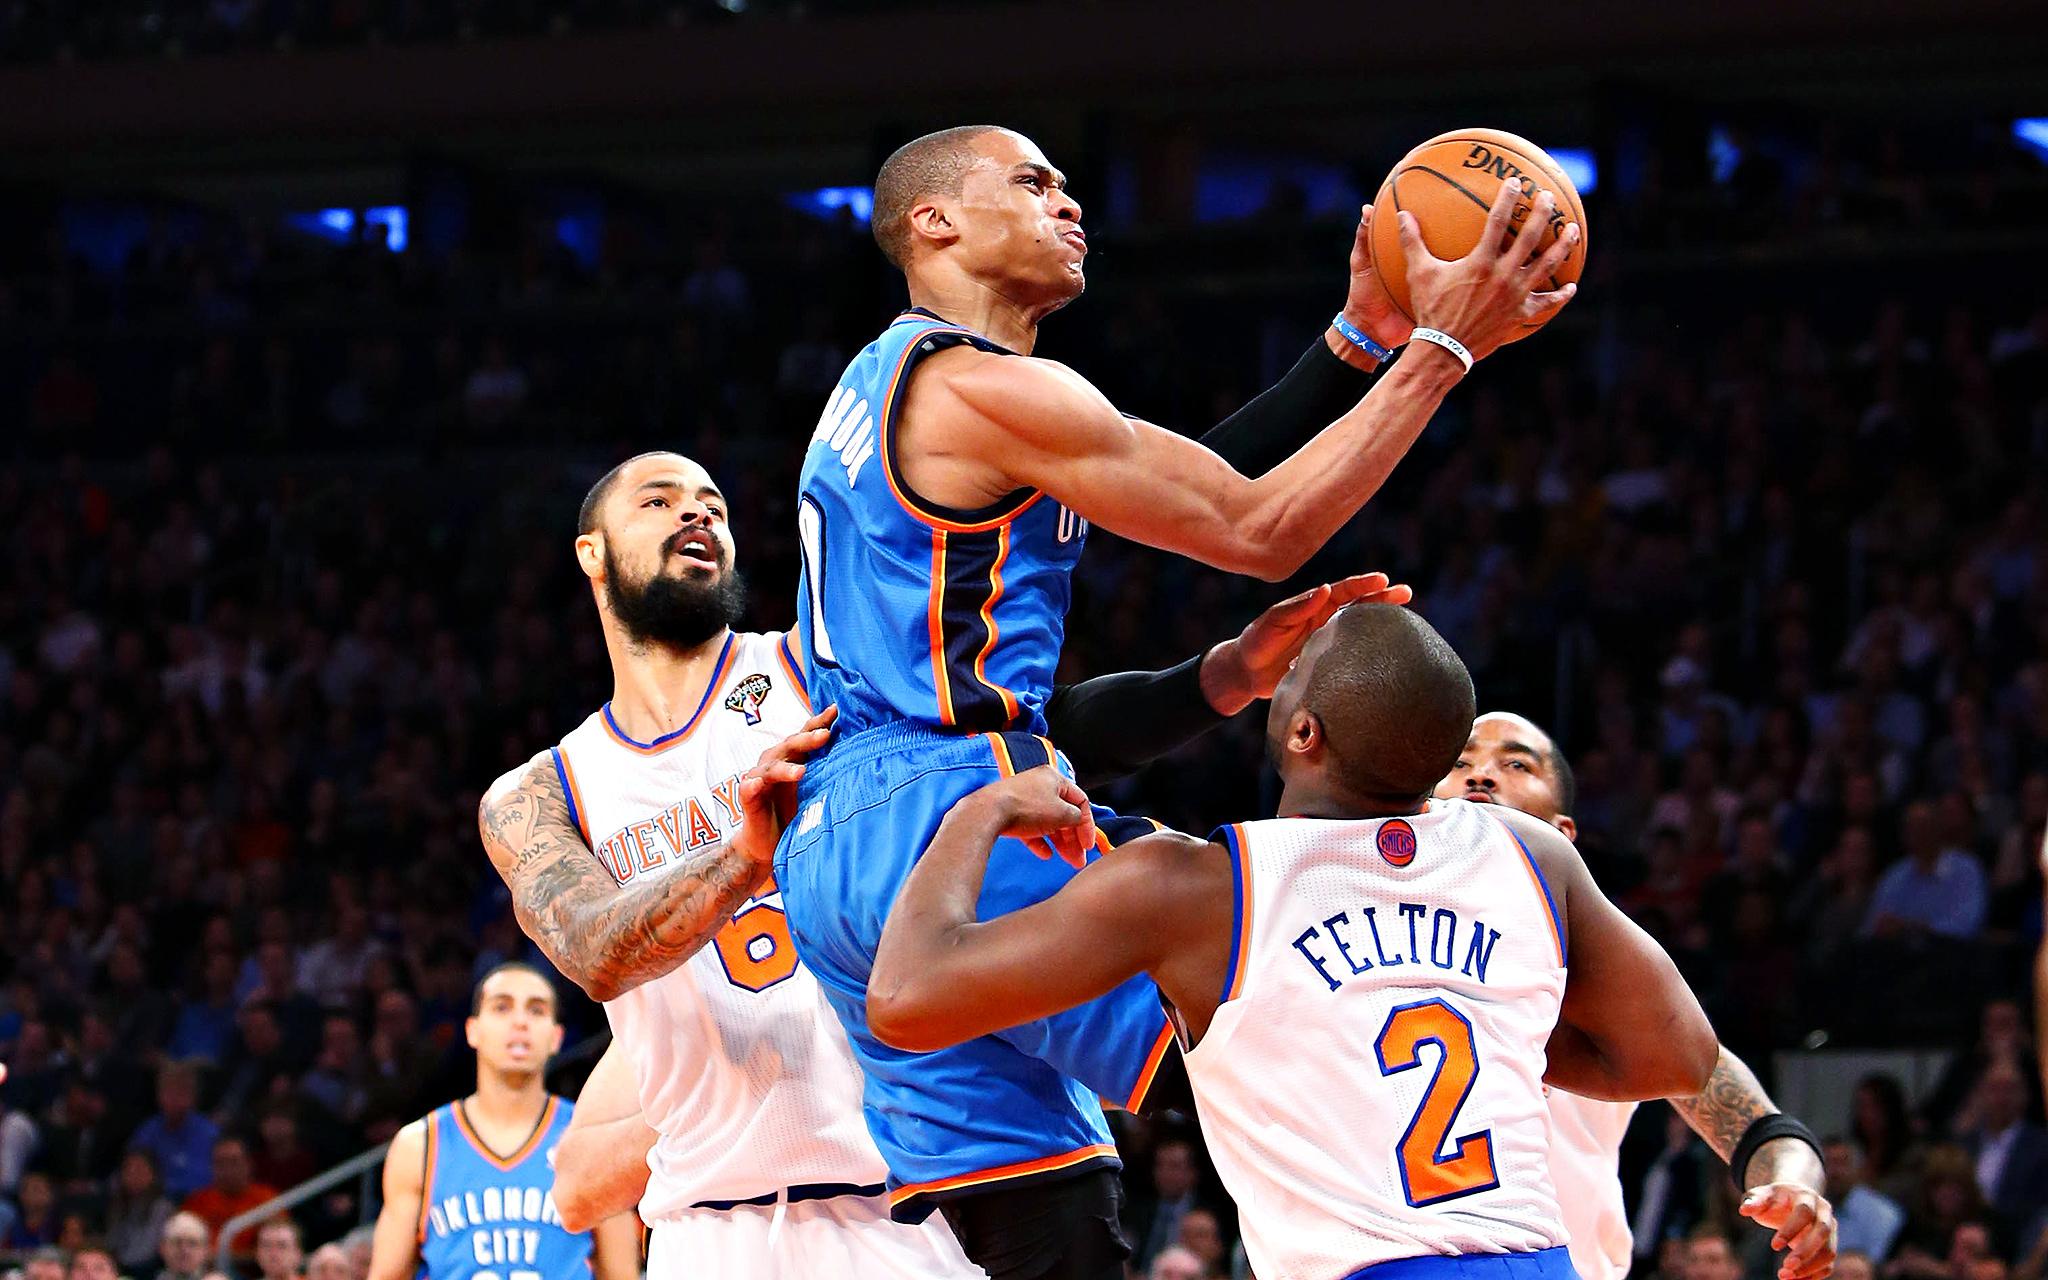 J.R. Shot Not Enough - NBA Weekly Wrap Mar. 10, 2013 - ESPN